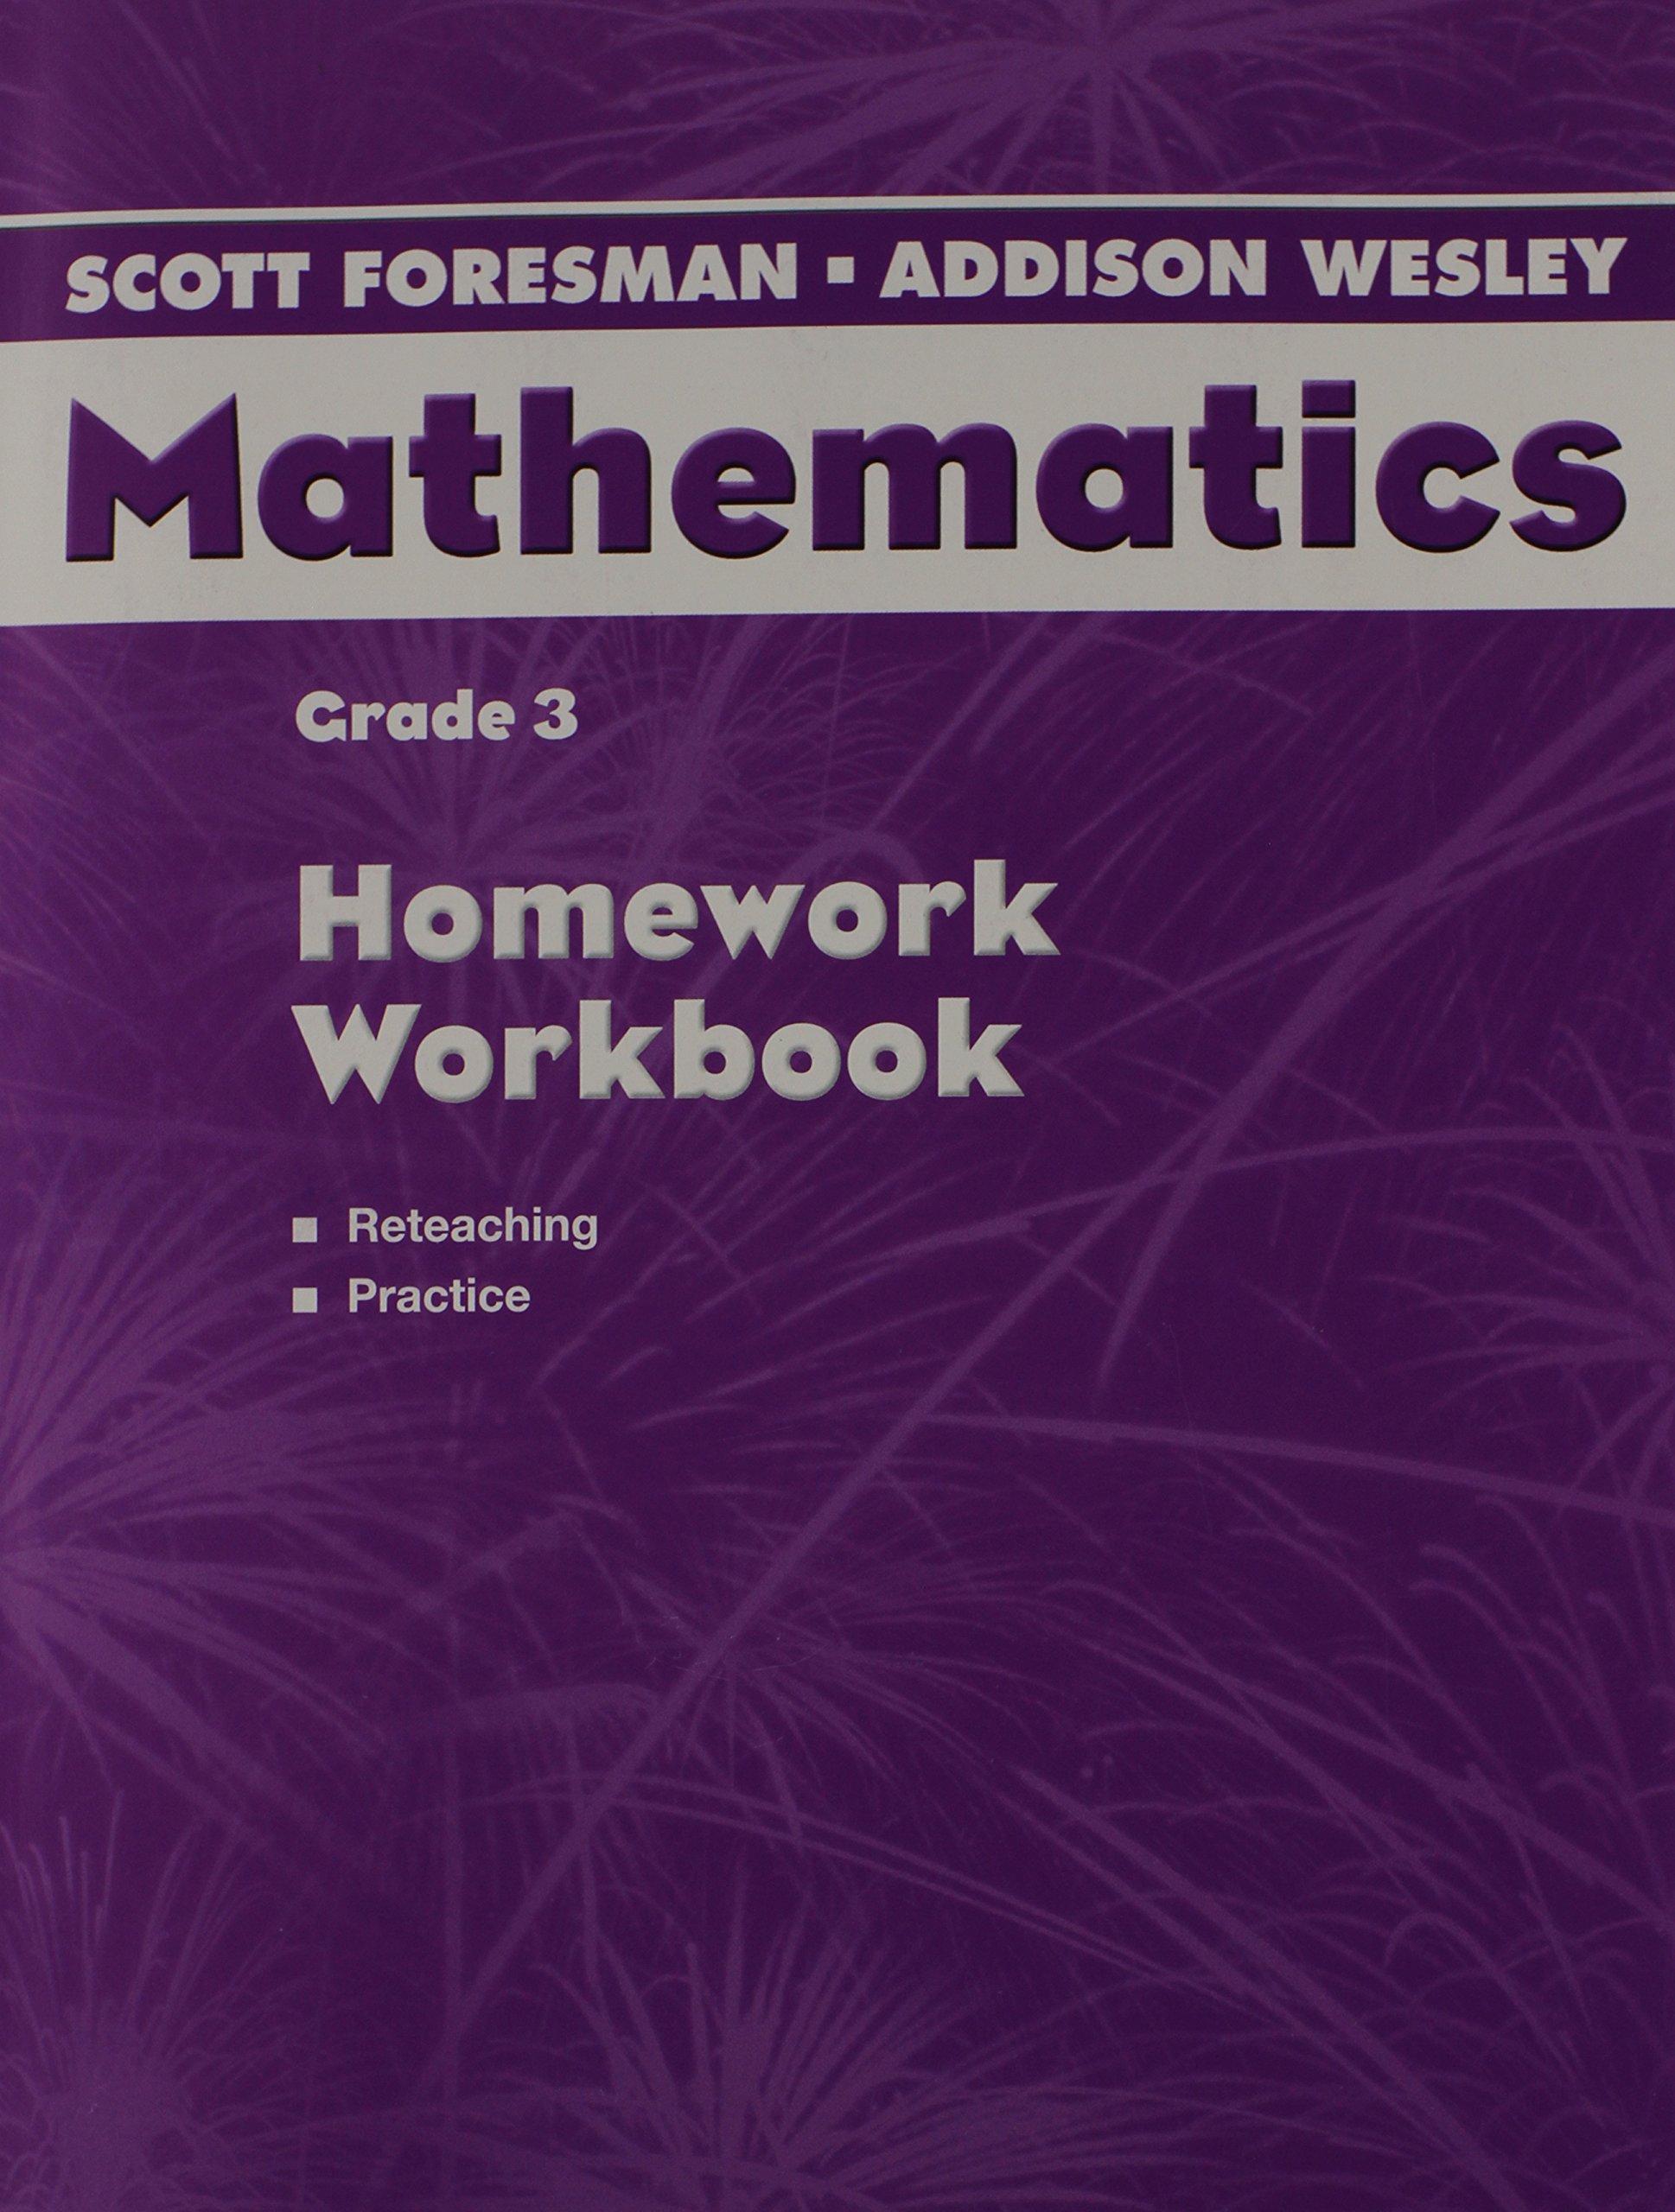 Amazon.com: Mathematics, Grade 3, Homework Workbook Answer Key ...